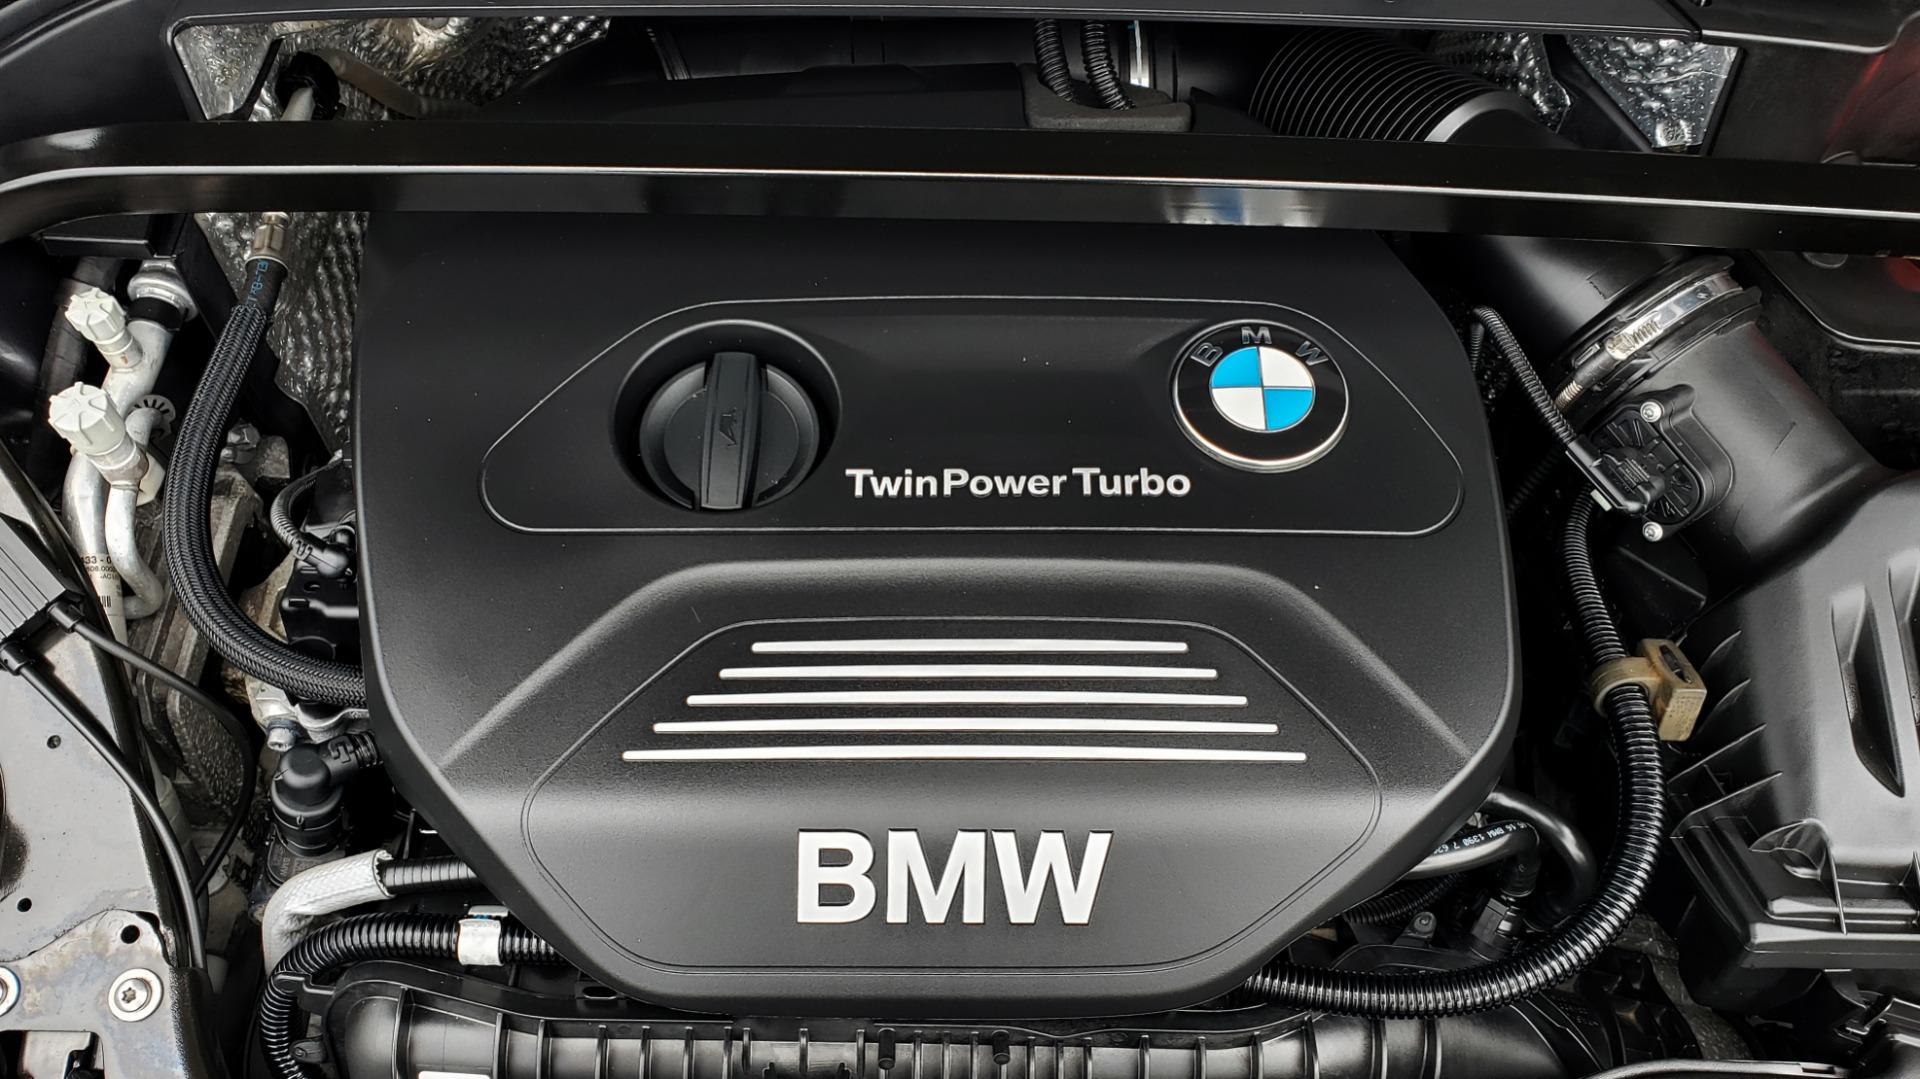 Used 2017 BMW X1 XDRIVE28I / PREM PKG / DRIVER ASST / NAV / CLD WTHR for sale Sold at Formula Imports in Charlotte NC 28227 12